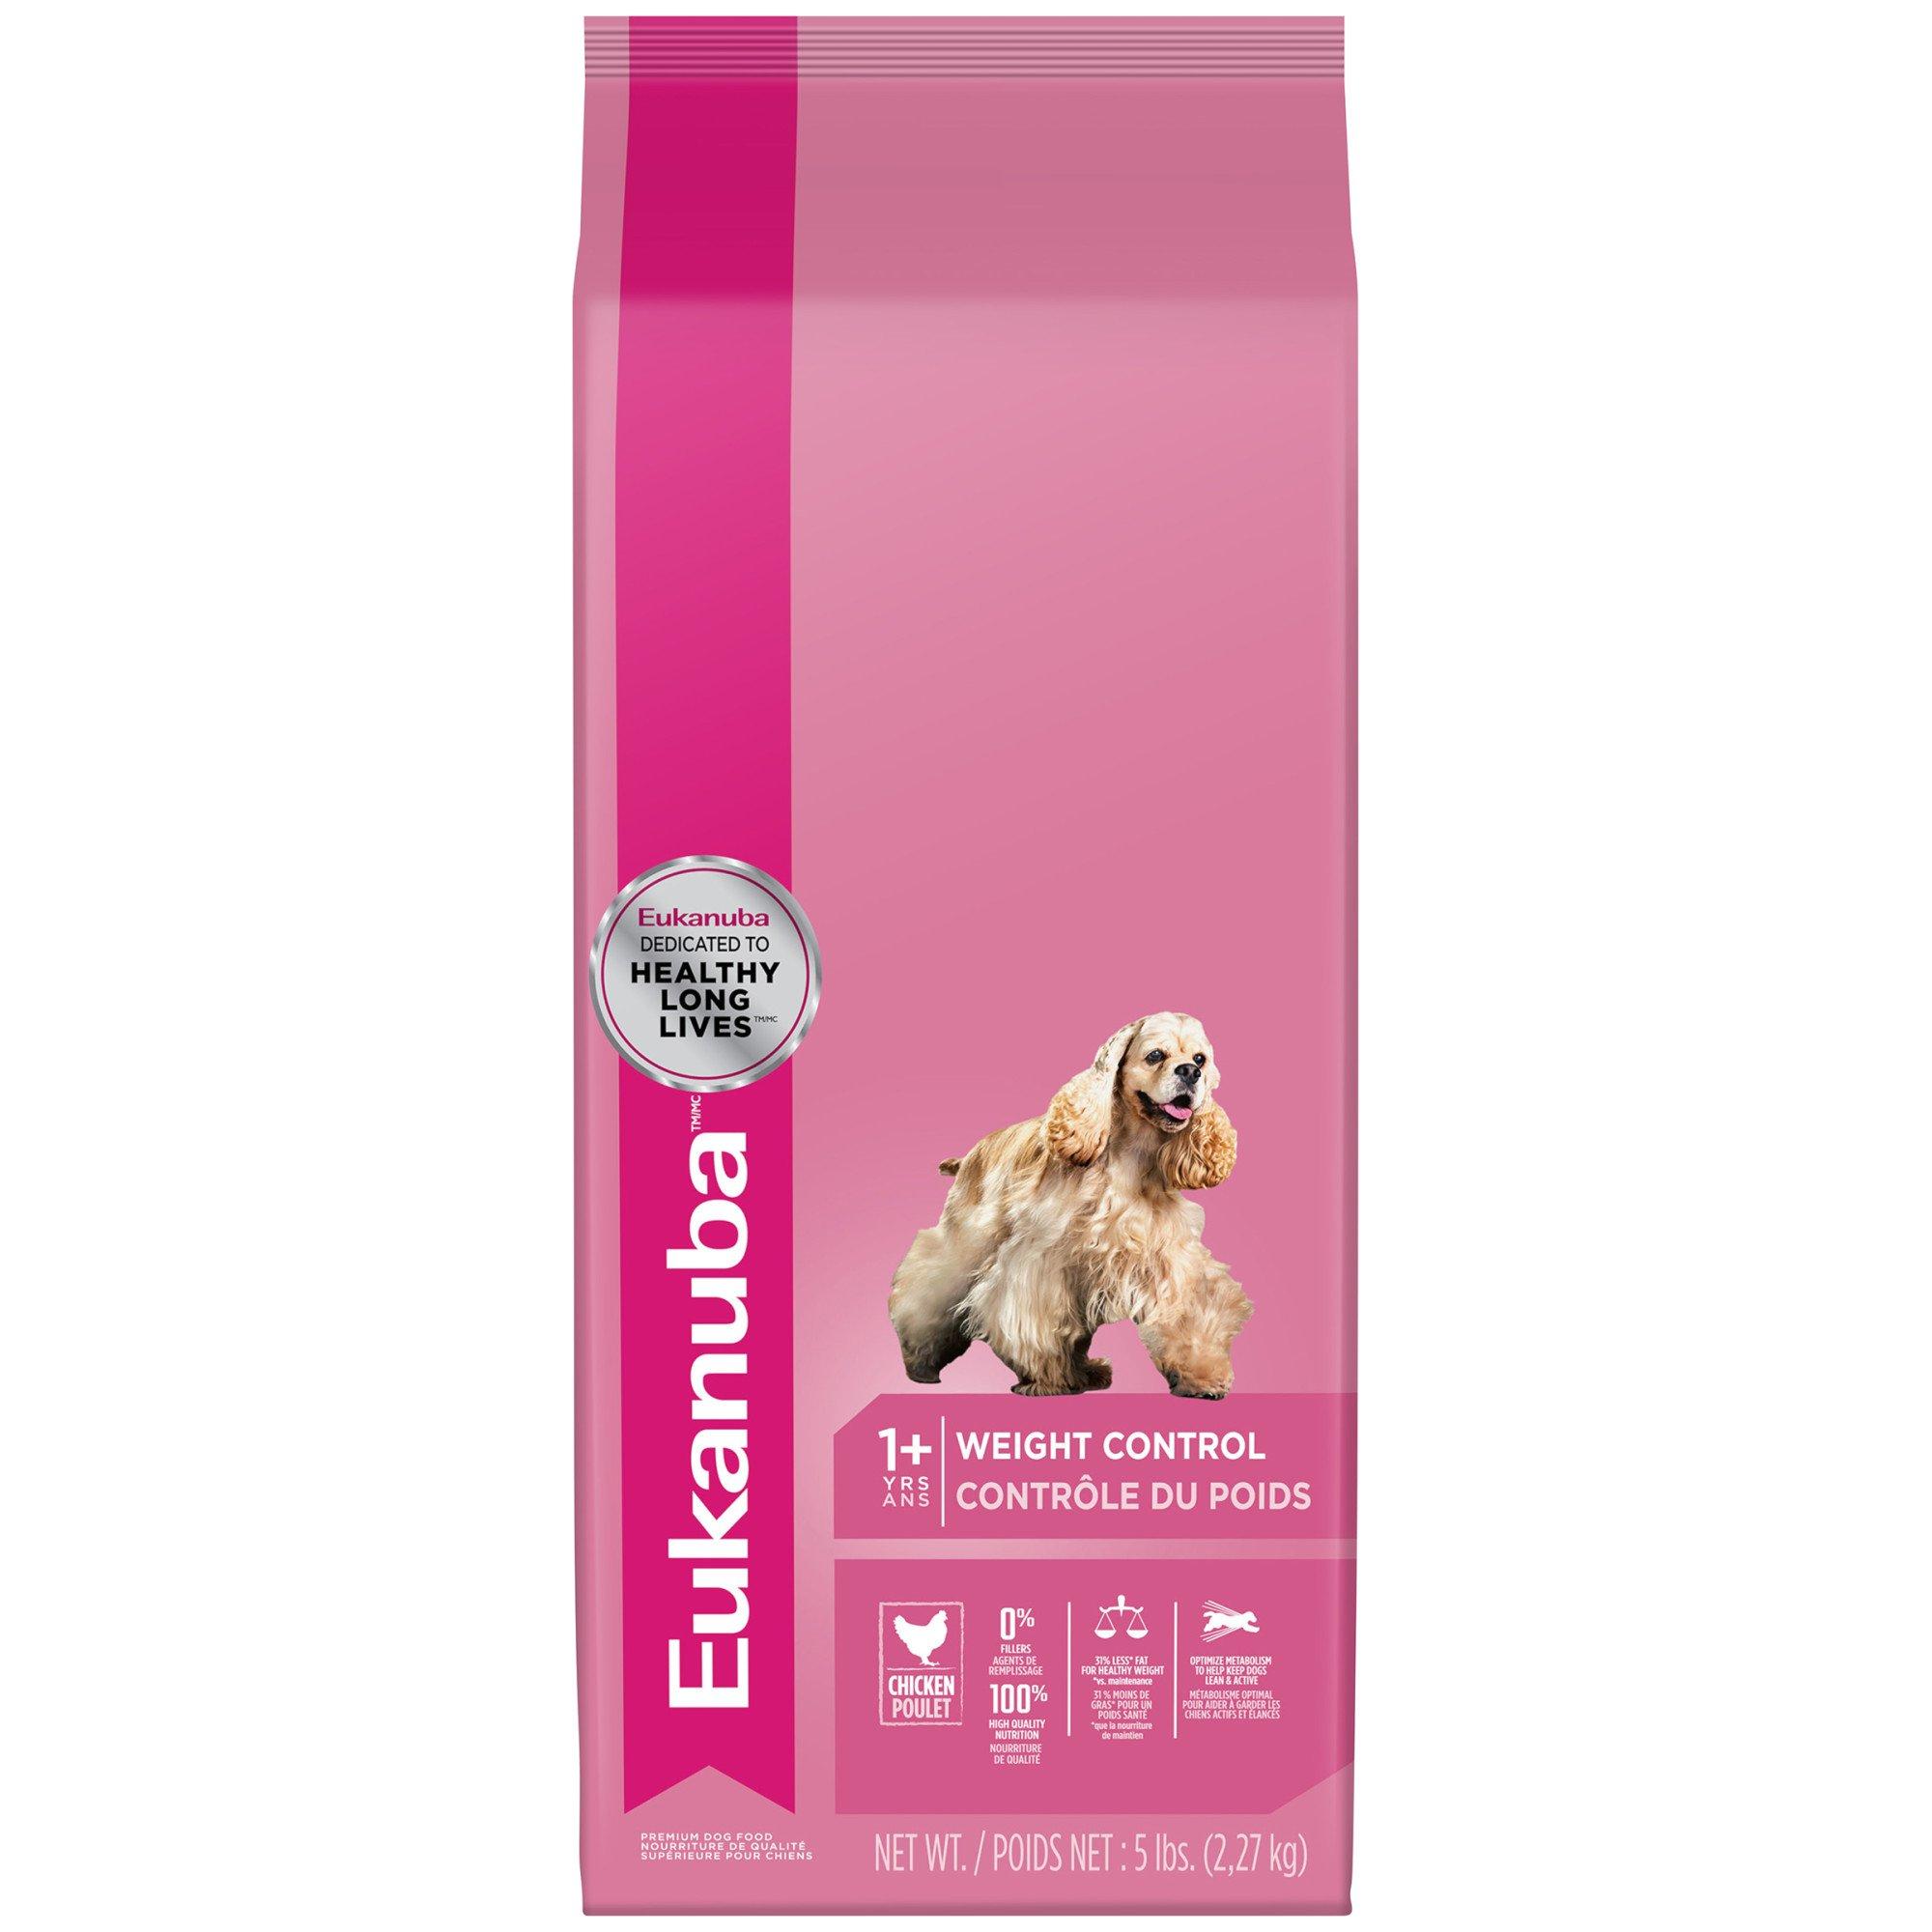 Eukaunba Adult Weight Control Dry Dog Food, 5 lbs